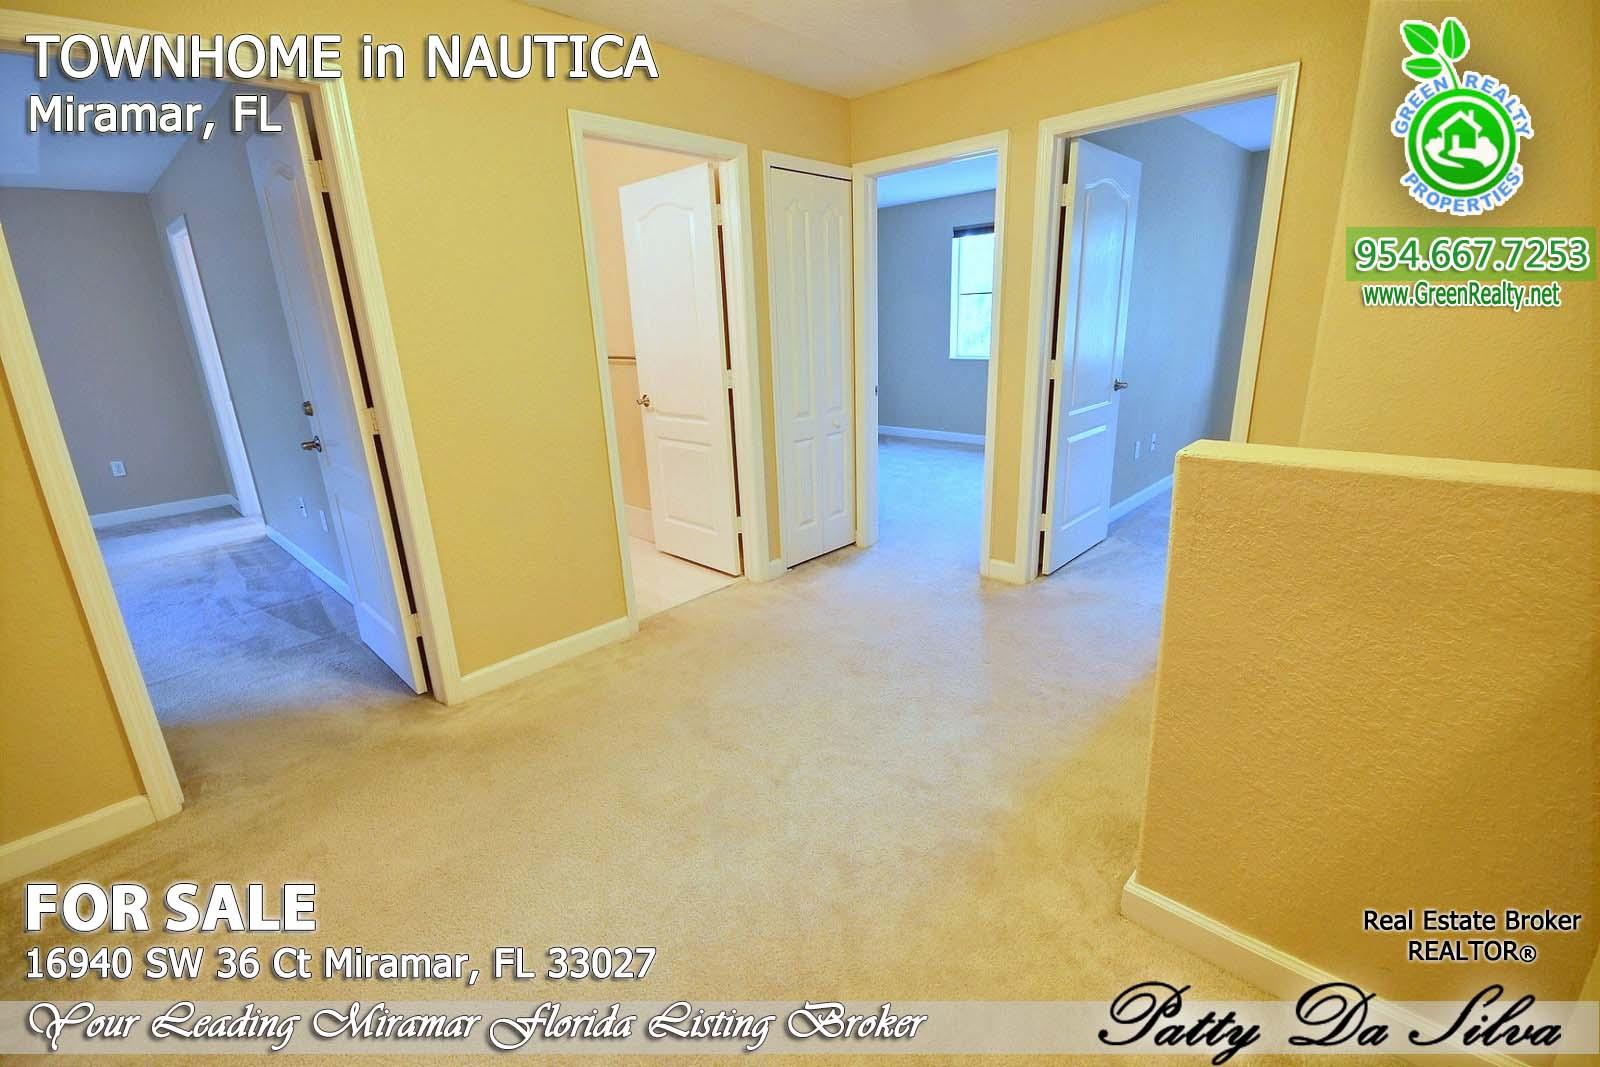 16940 SW 36 Ct Miramar, FL 33027 - Nautica Miramar Homes For Sale (22)